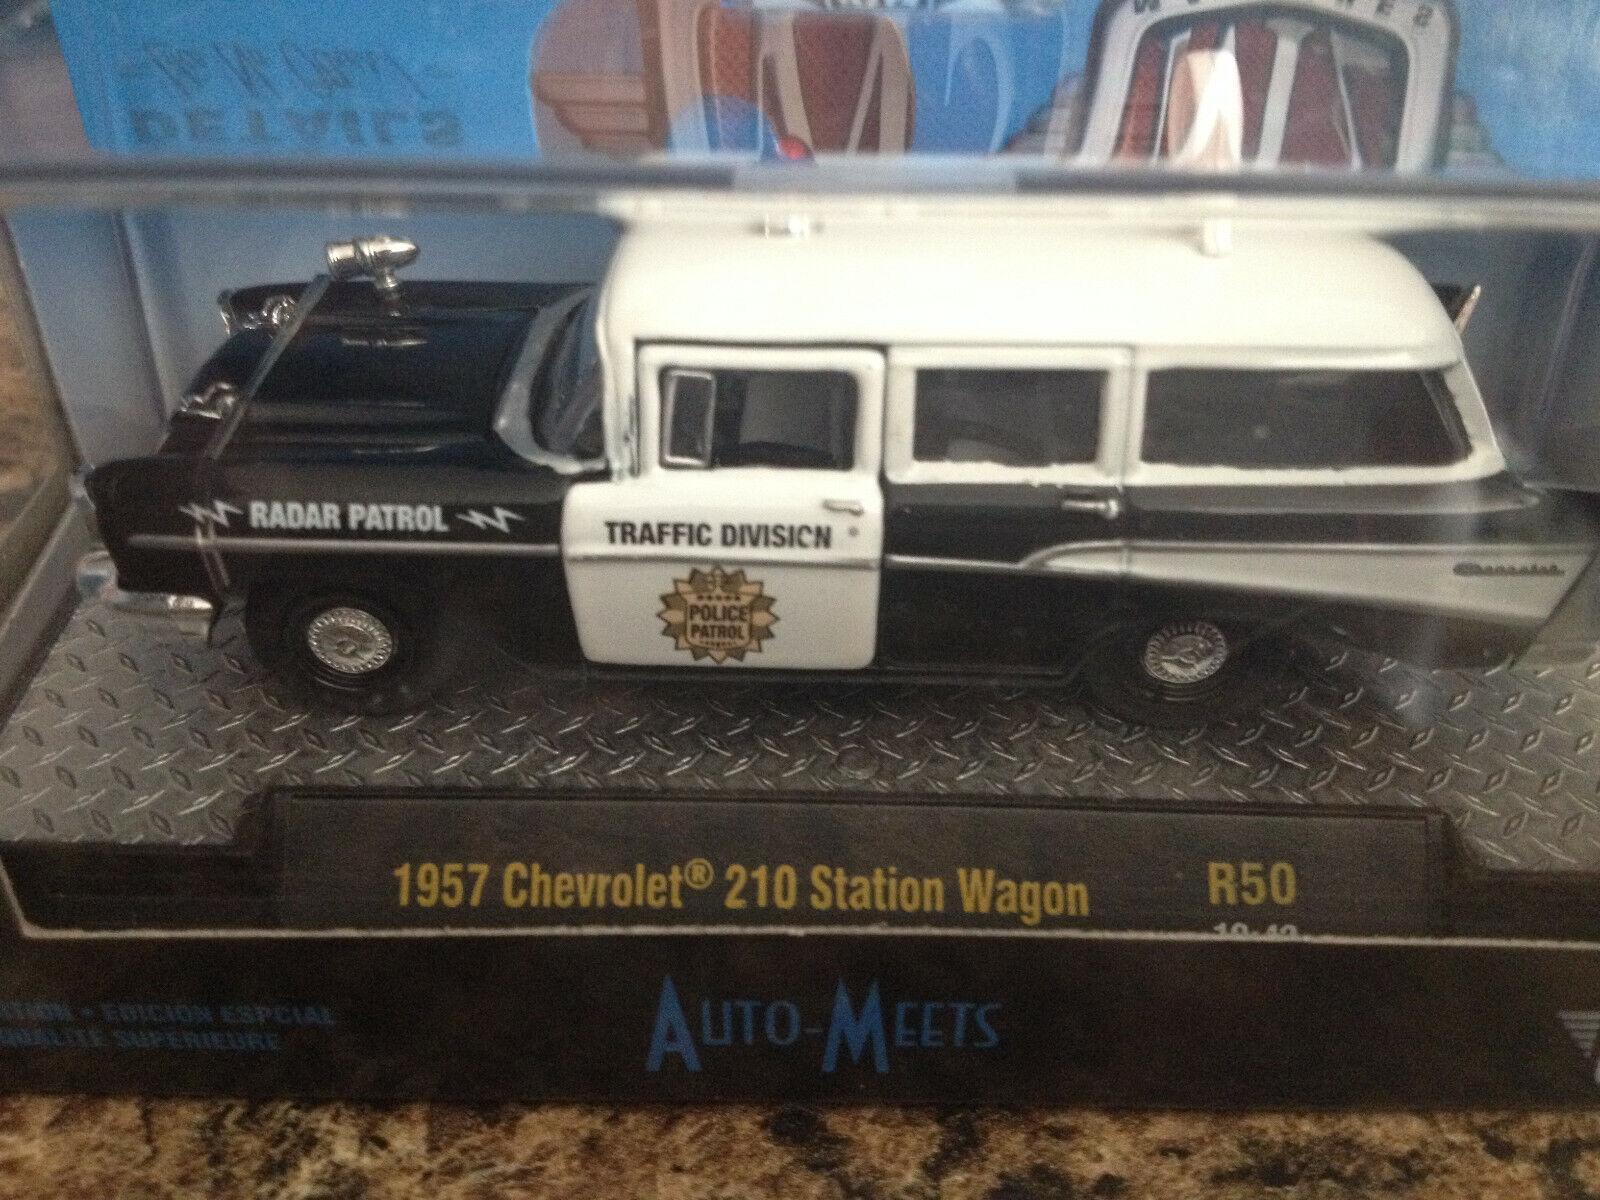 M2 MACHINES 2019 AUTO MEETS 1957 CHEVROLET 210 STATION WAGON